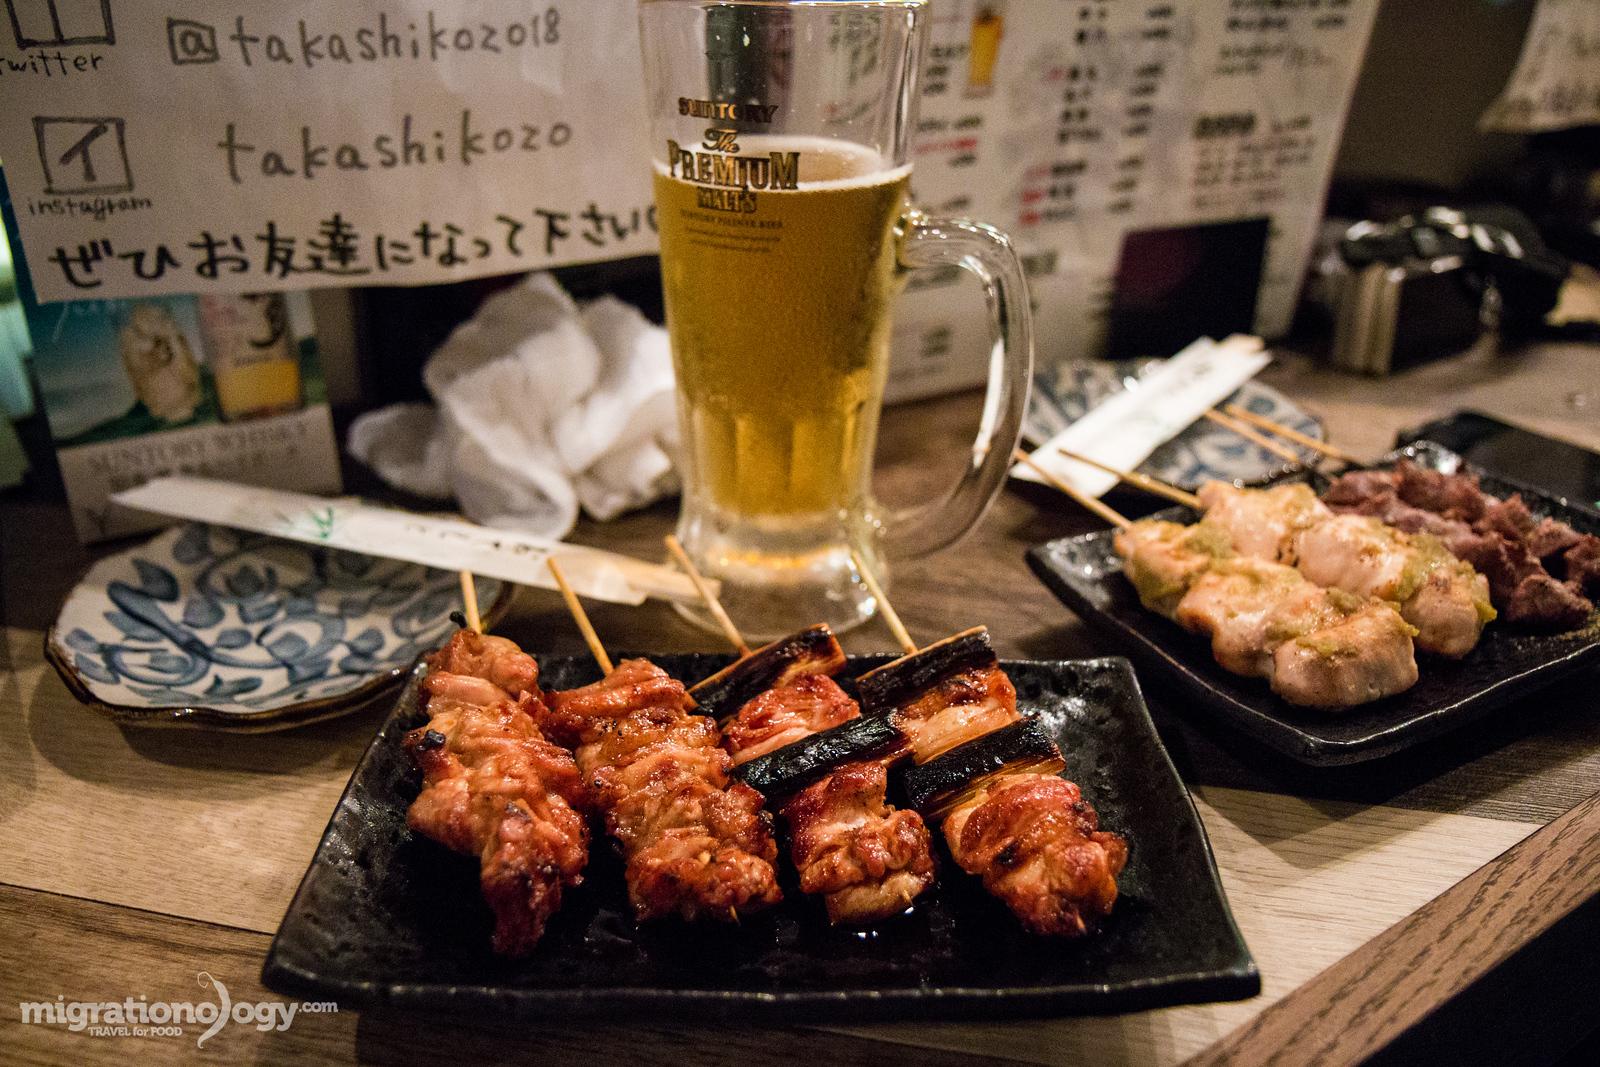 izakaya food in Japan